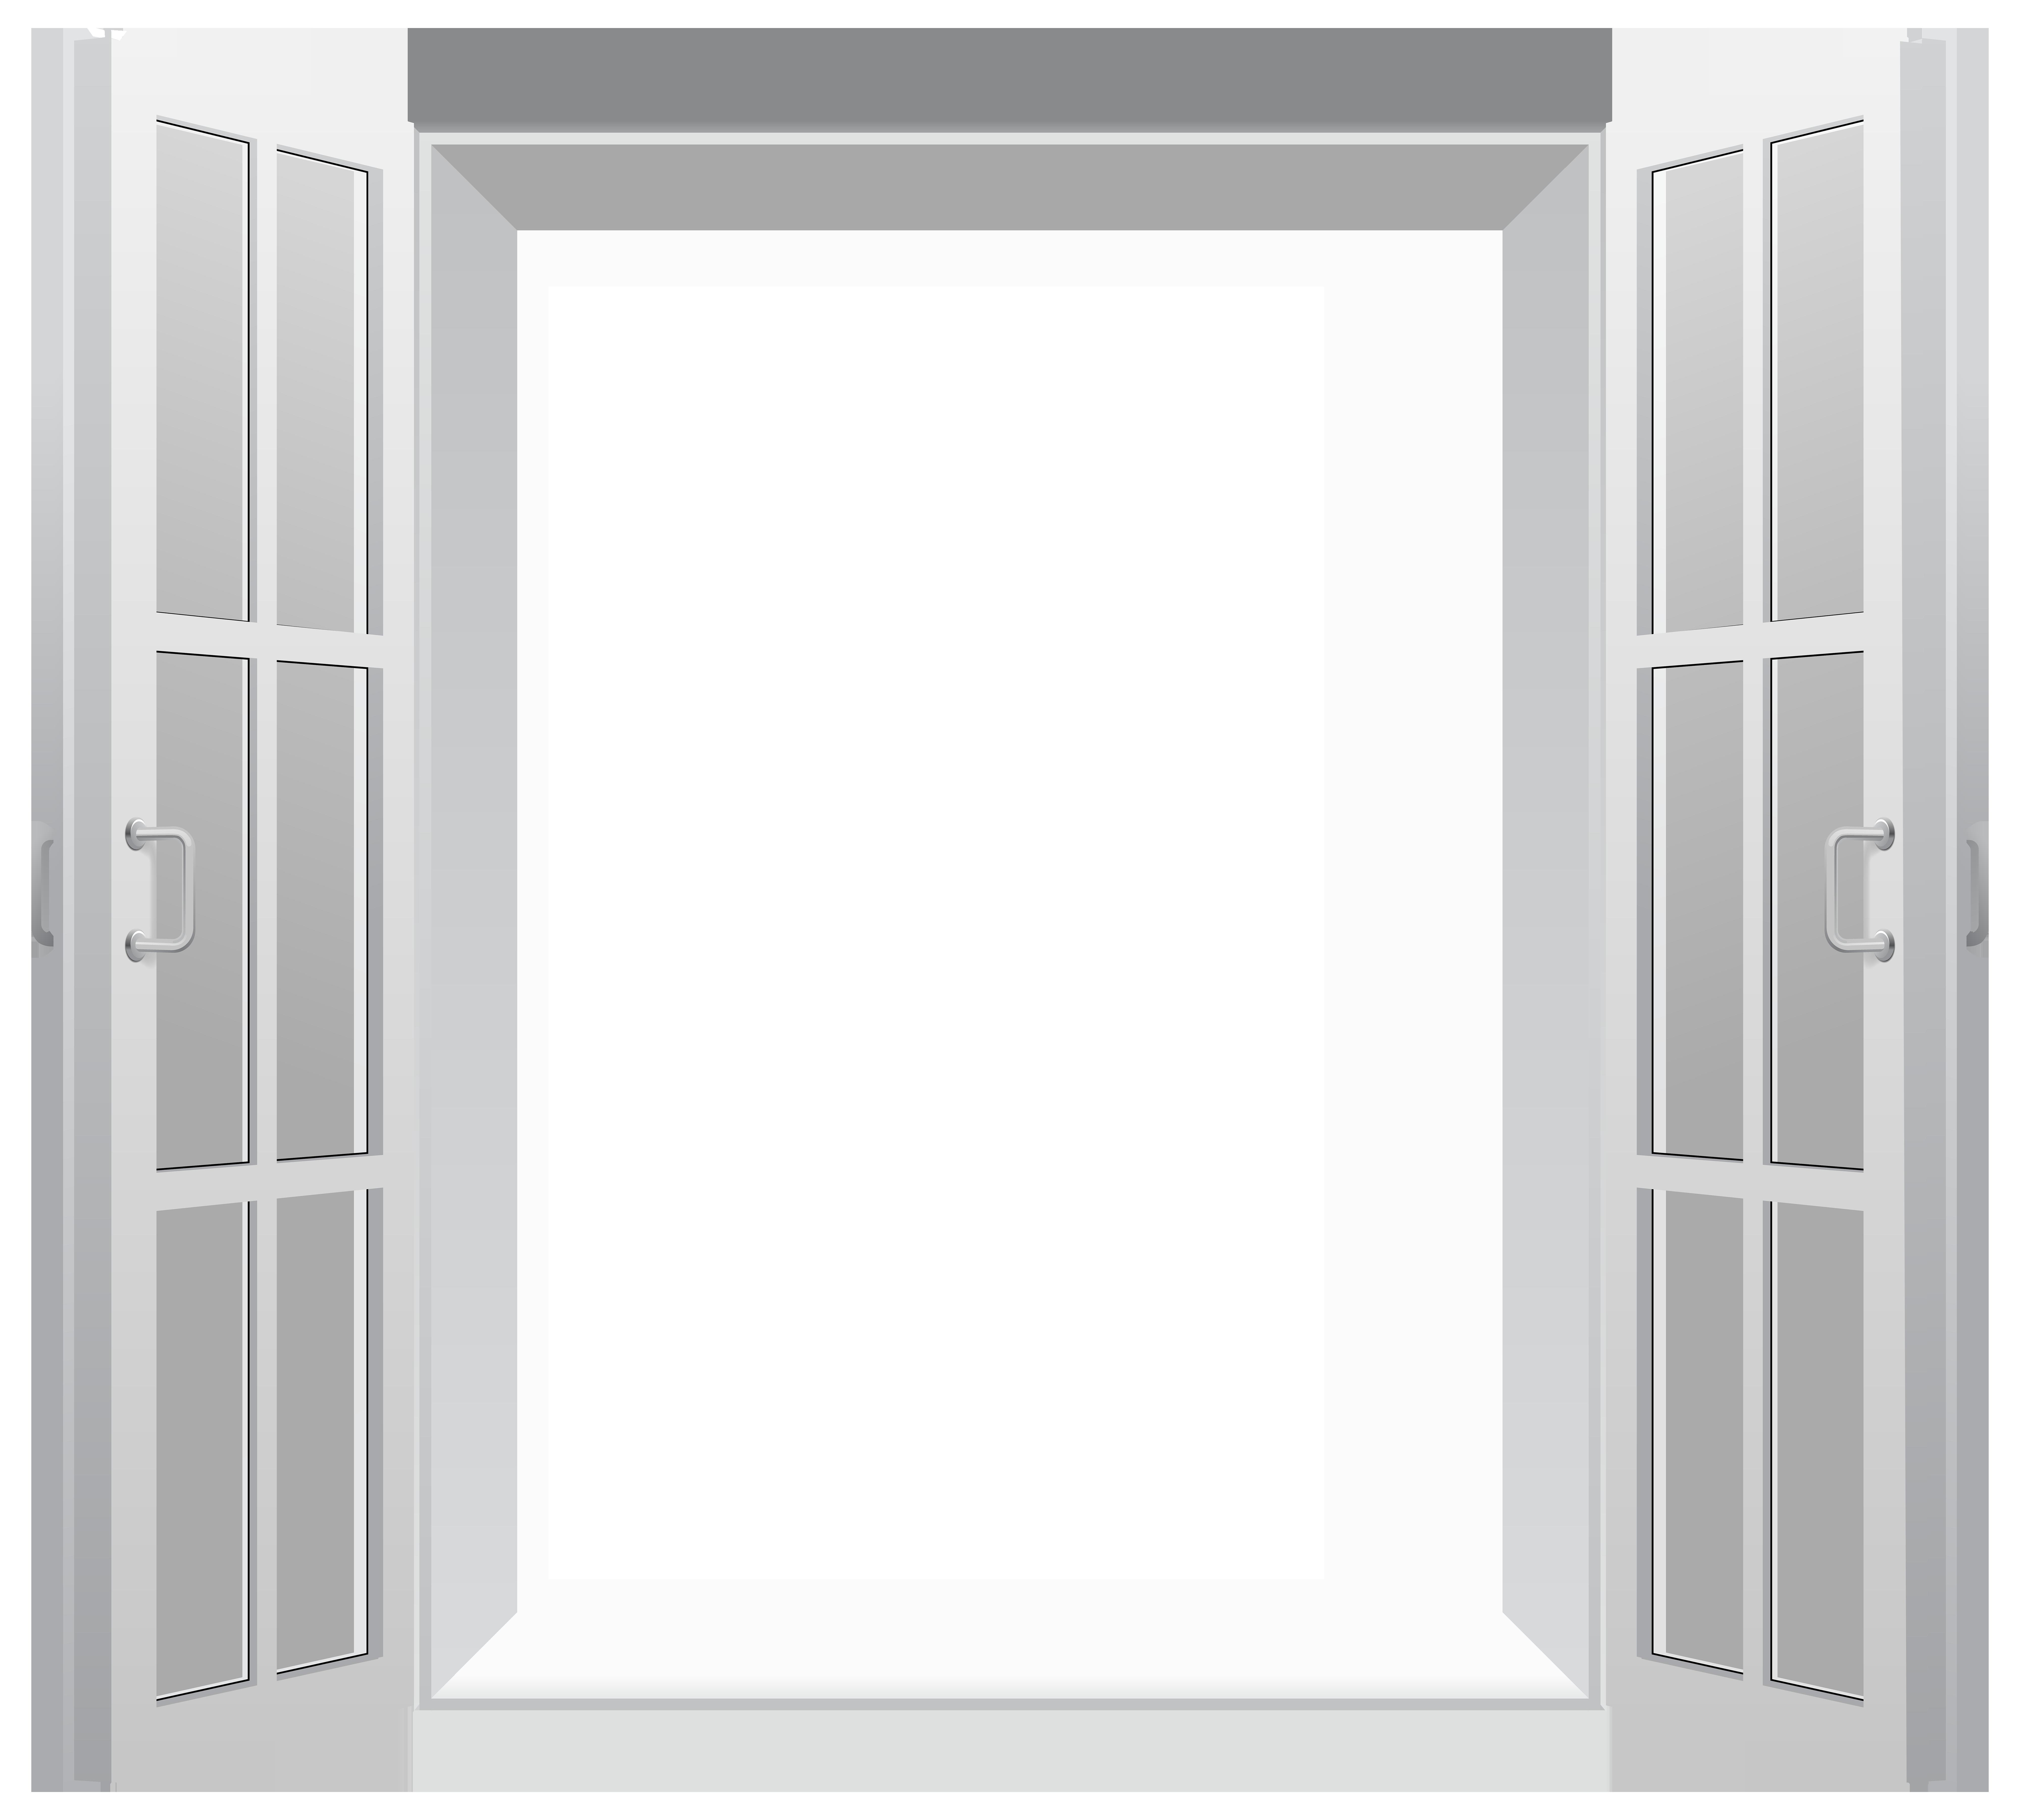 Window clipart transparent image transparent library Window Door Columns Clip art - window clipart png download ... image transparent library